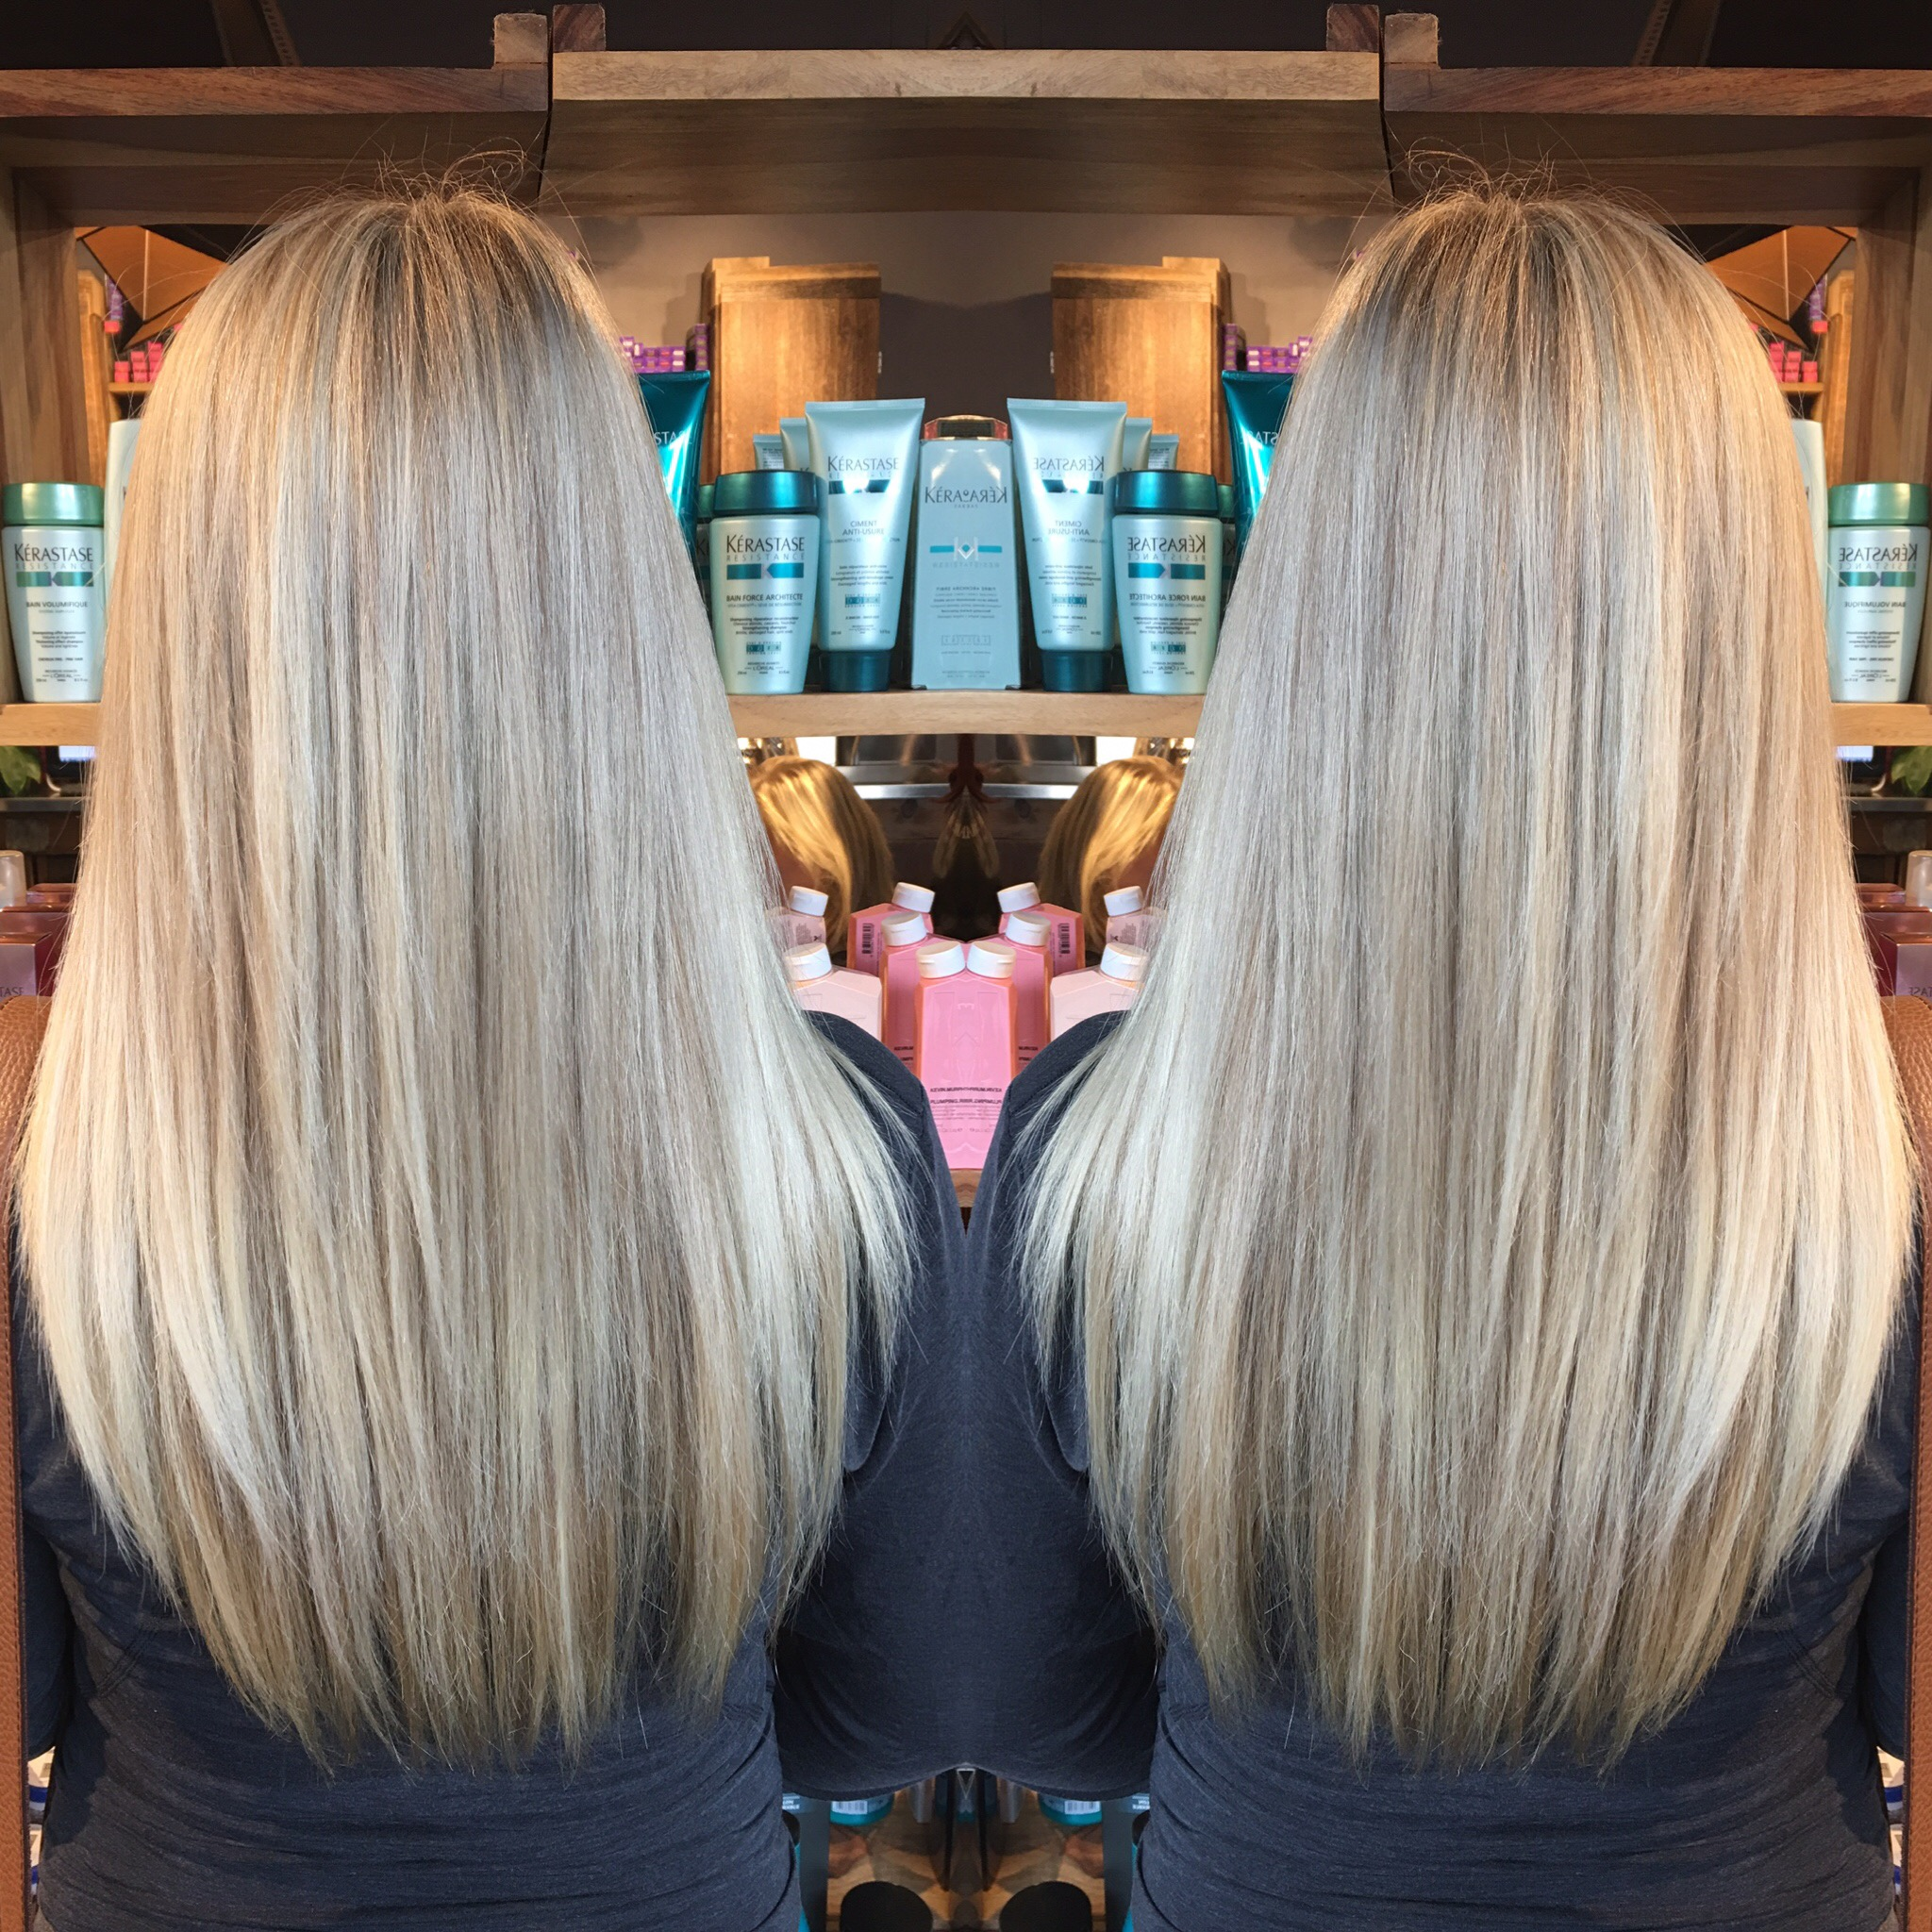 Best blondes highlights toronto salon tony shamas olaplex for Olaplex salon